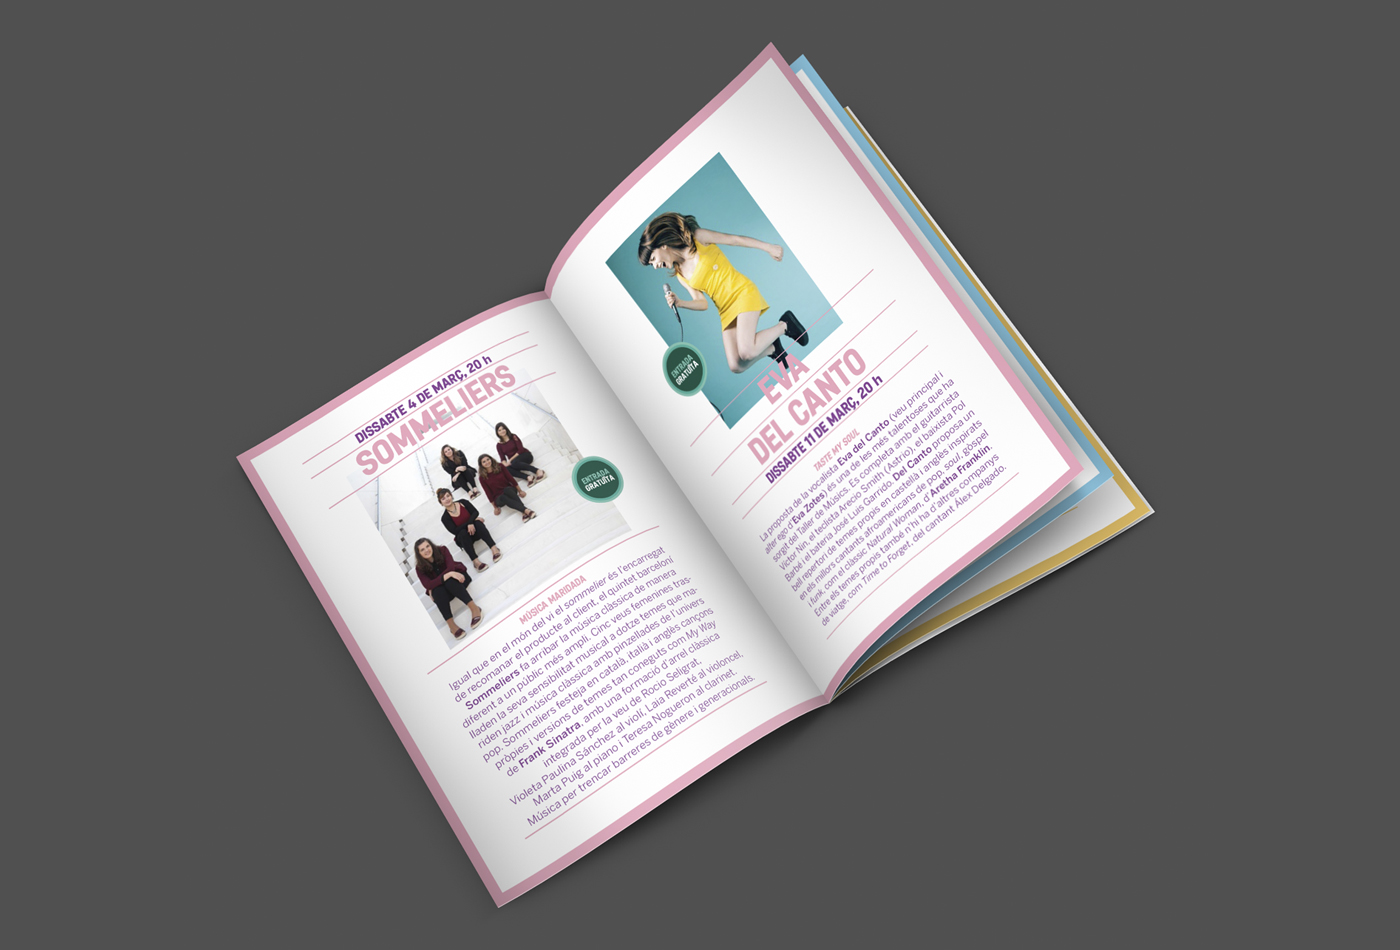 programa-born-cancons-creartiva-disseny-grafic-branding